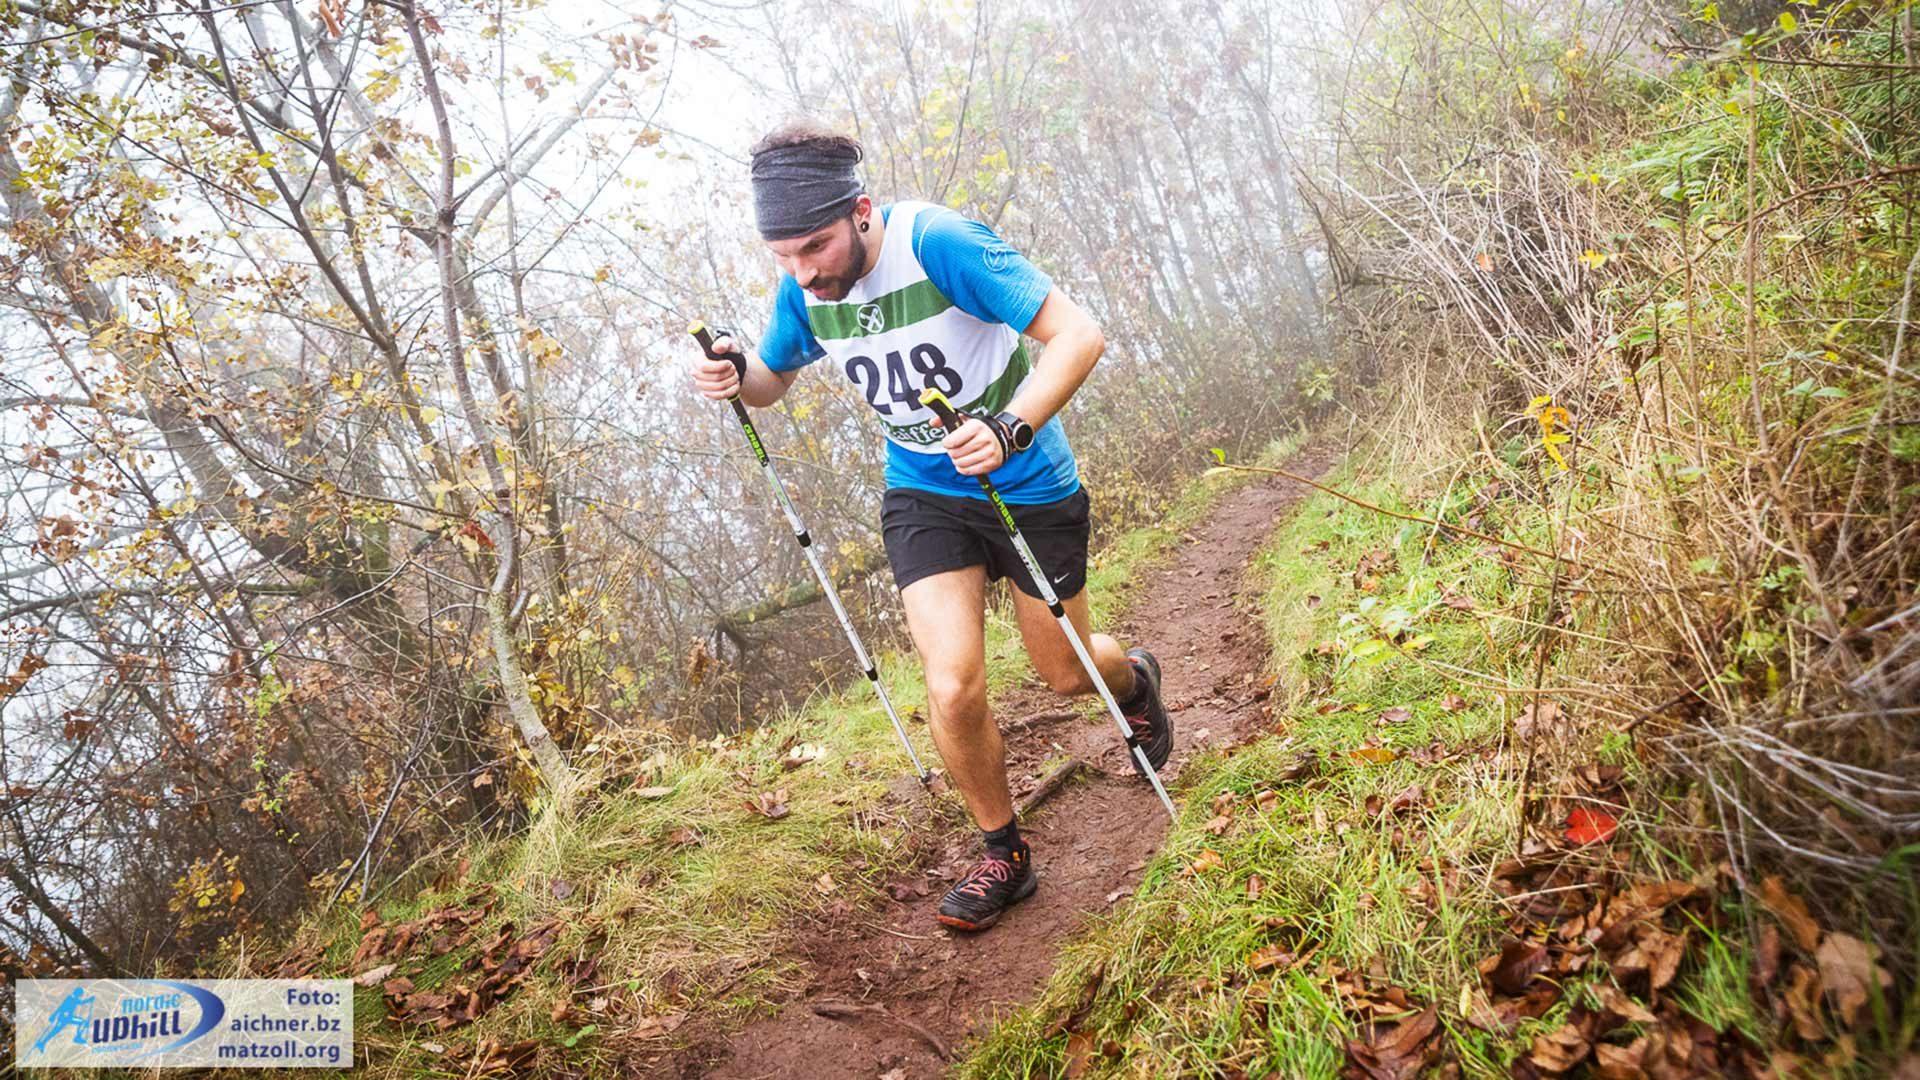 Nordic Uphill